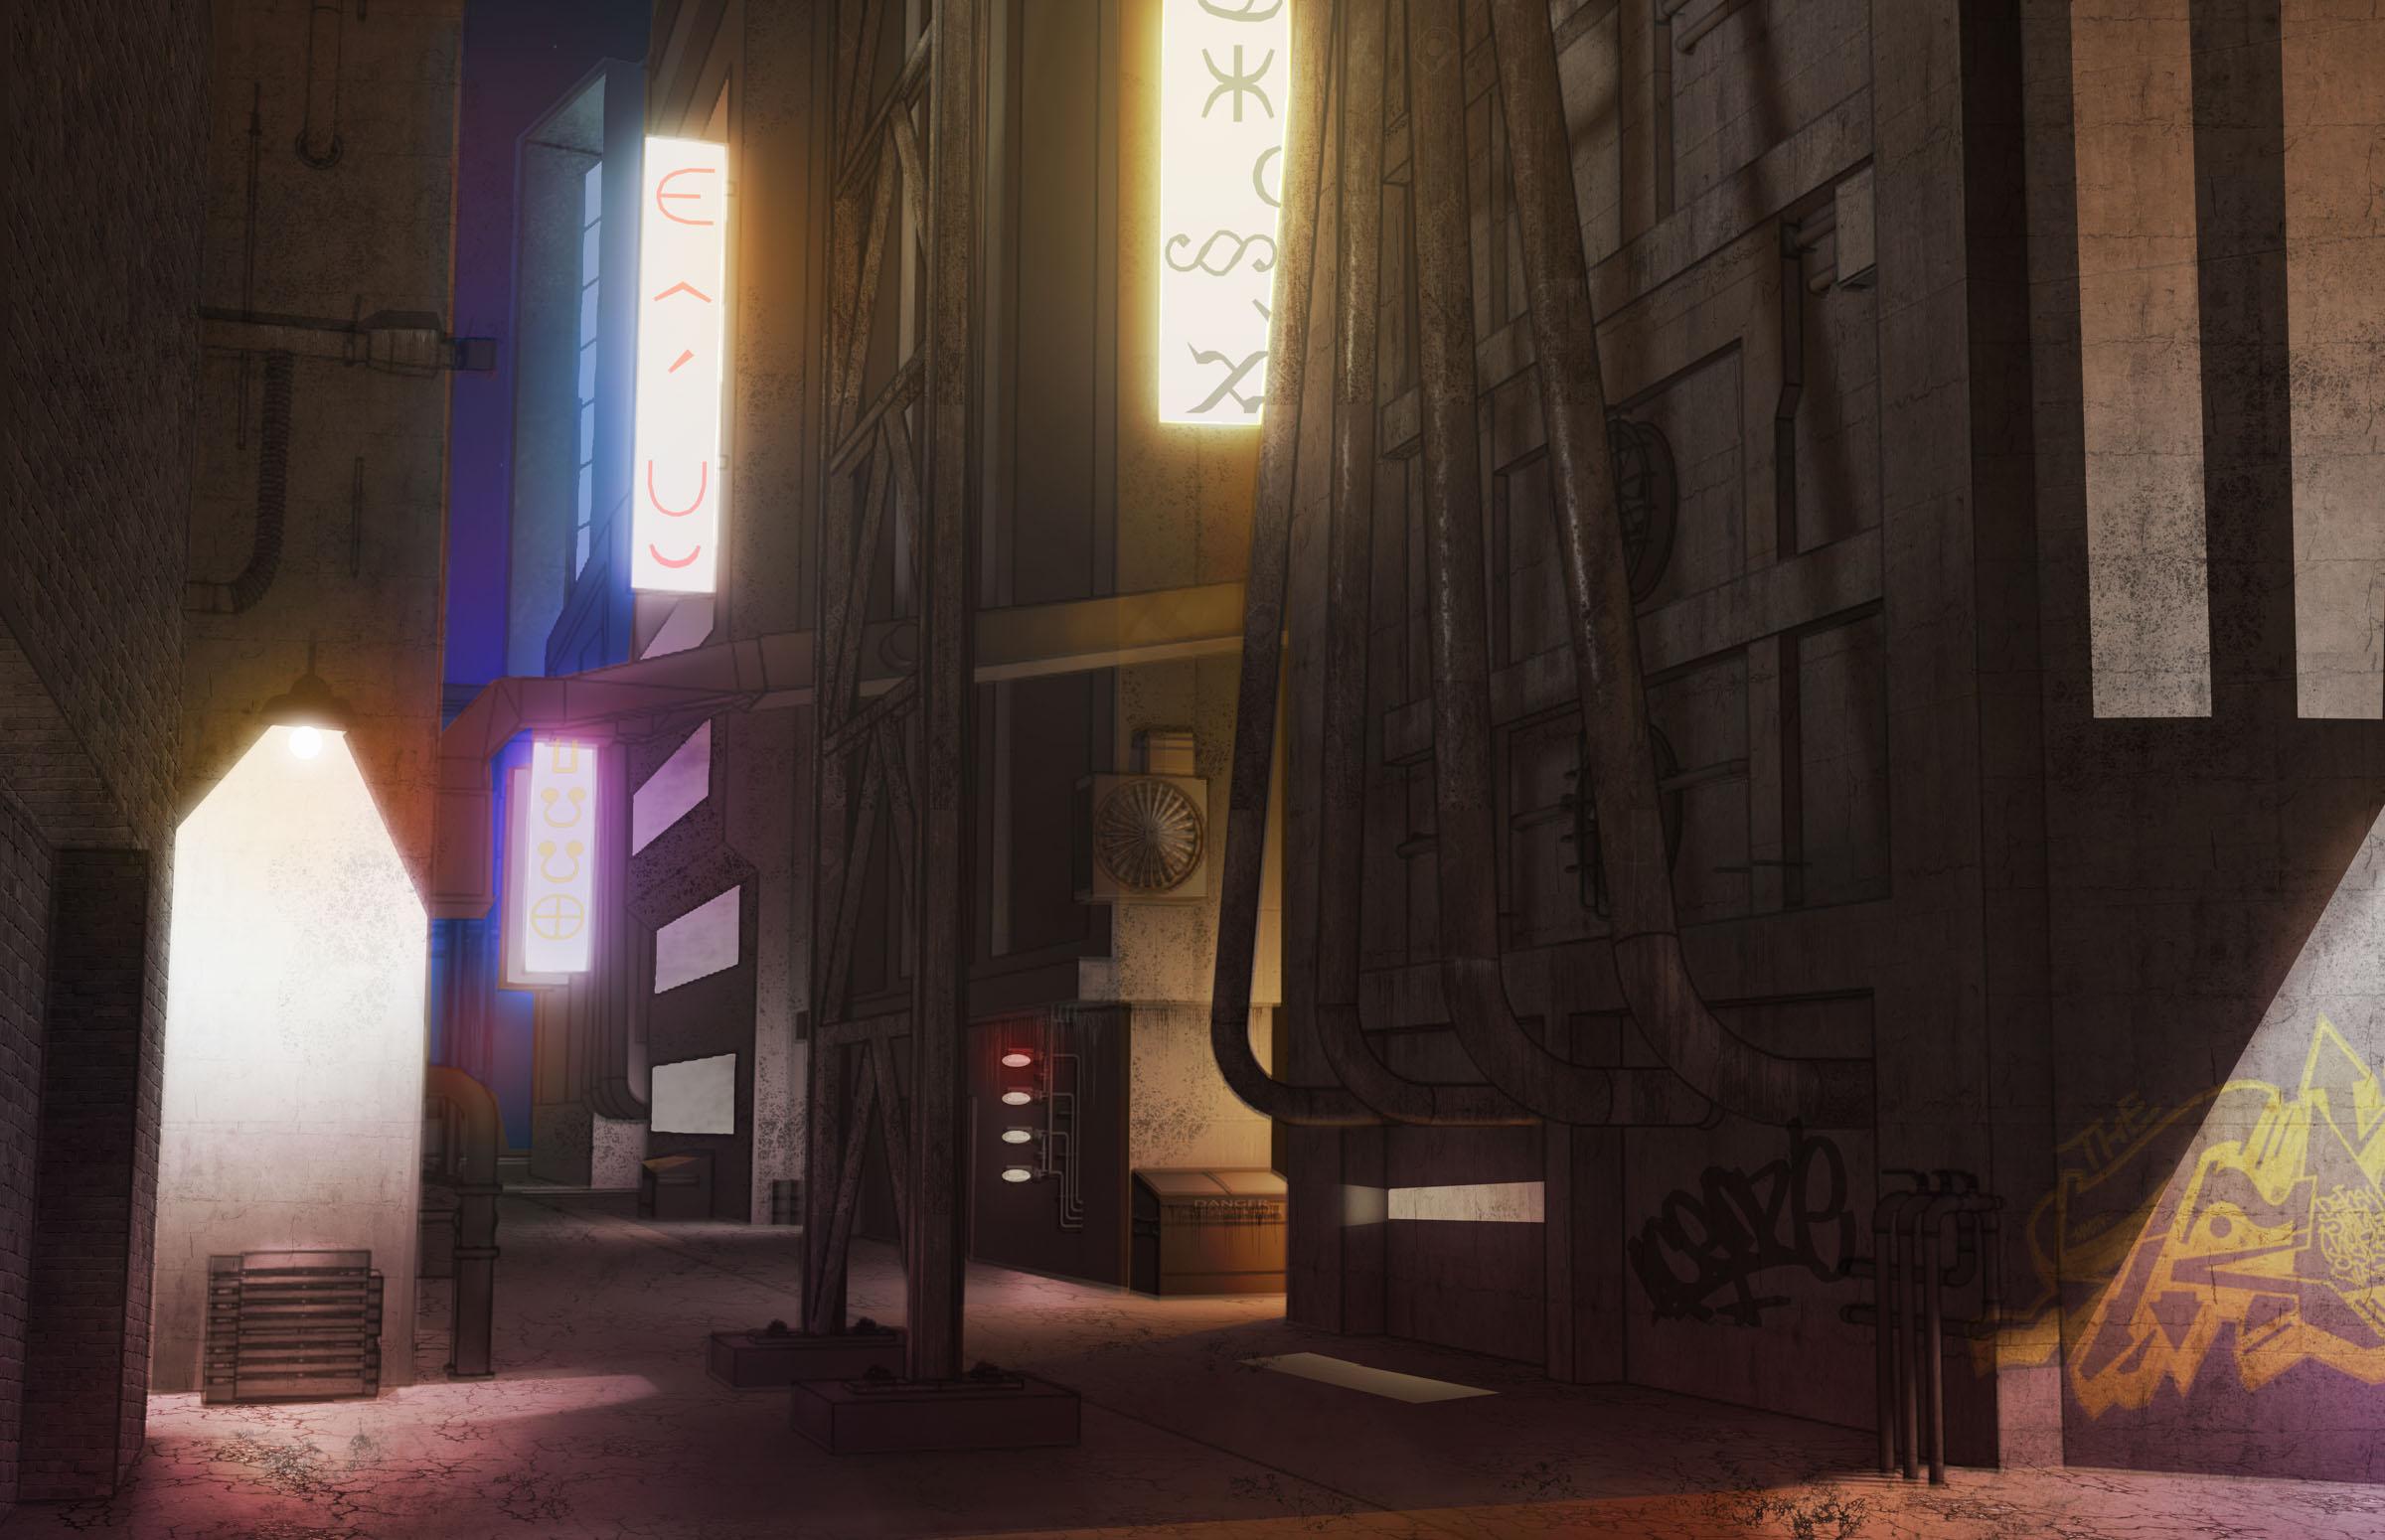 Digital Painting - Distopian City Alley Concept